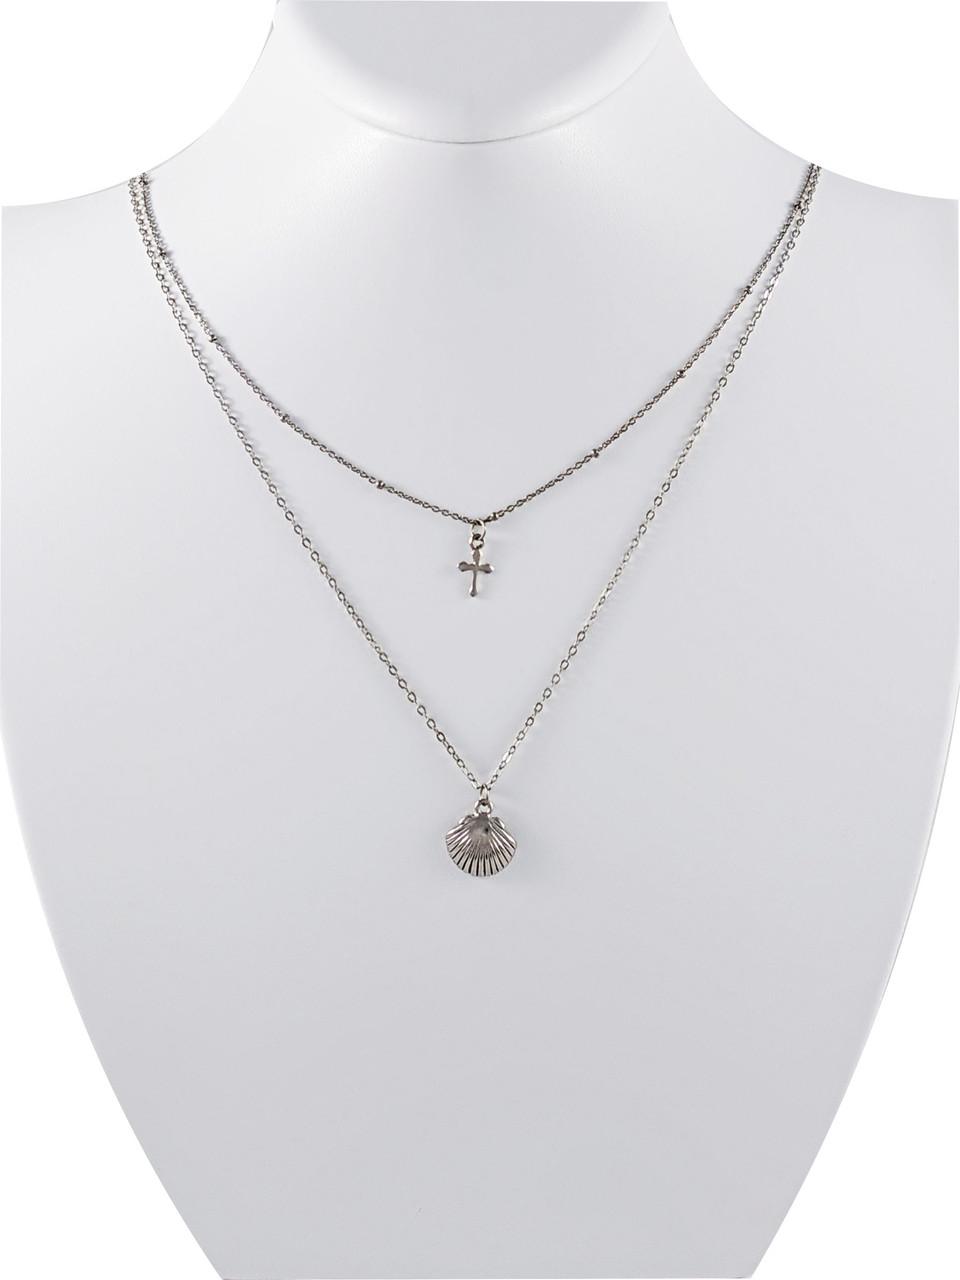 Колье серебряное NL856G